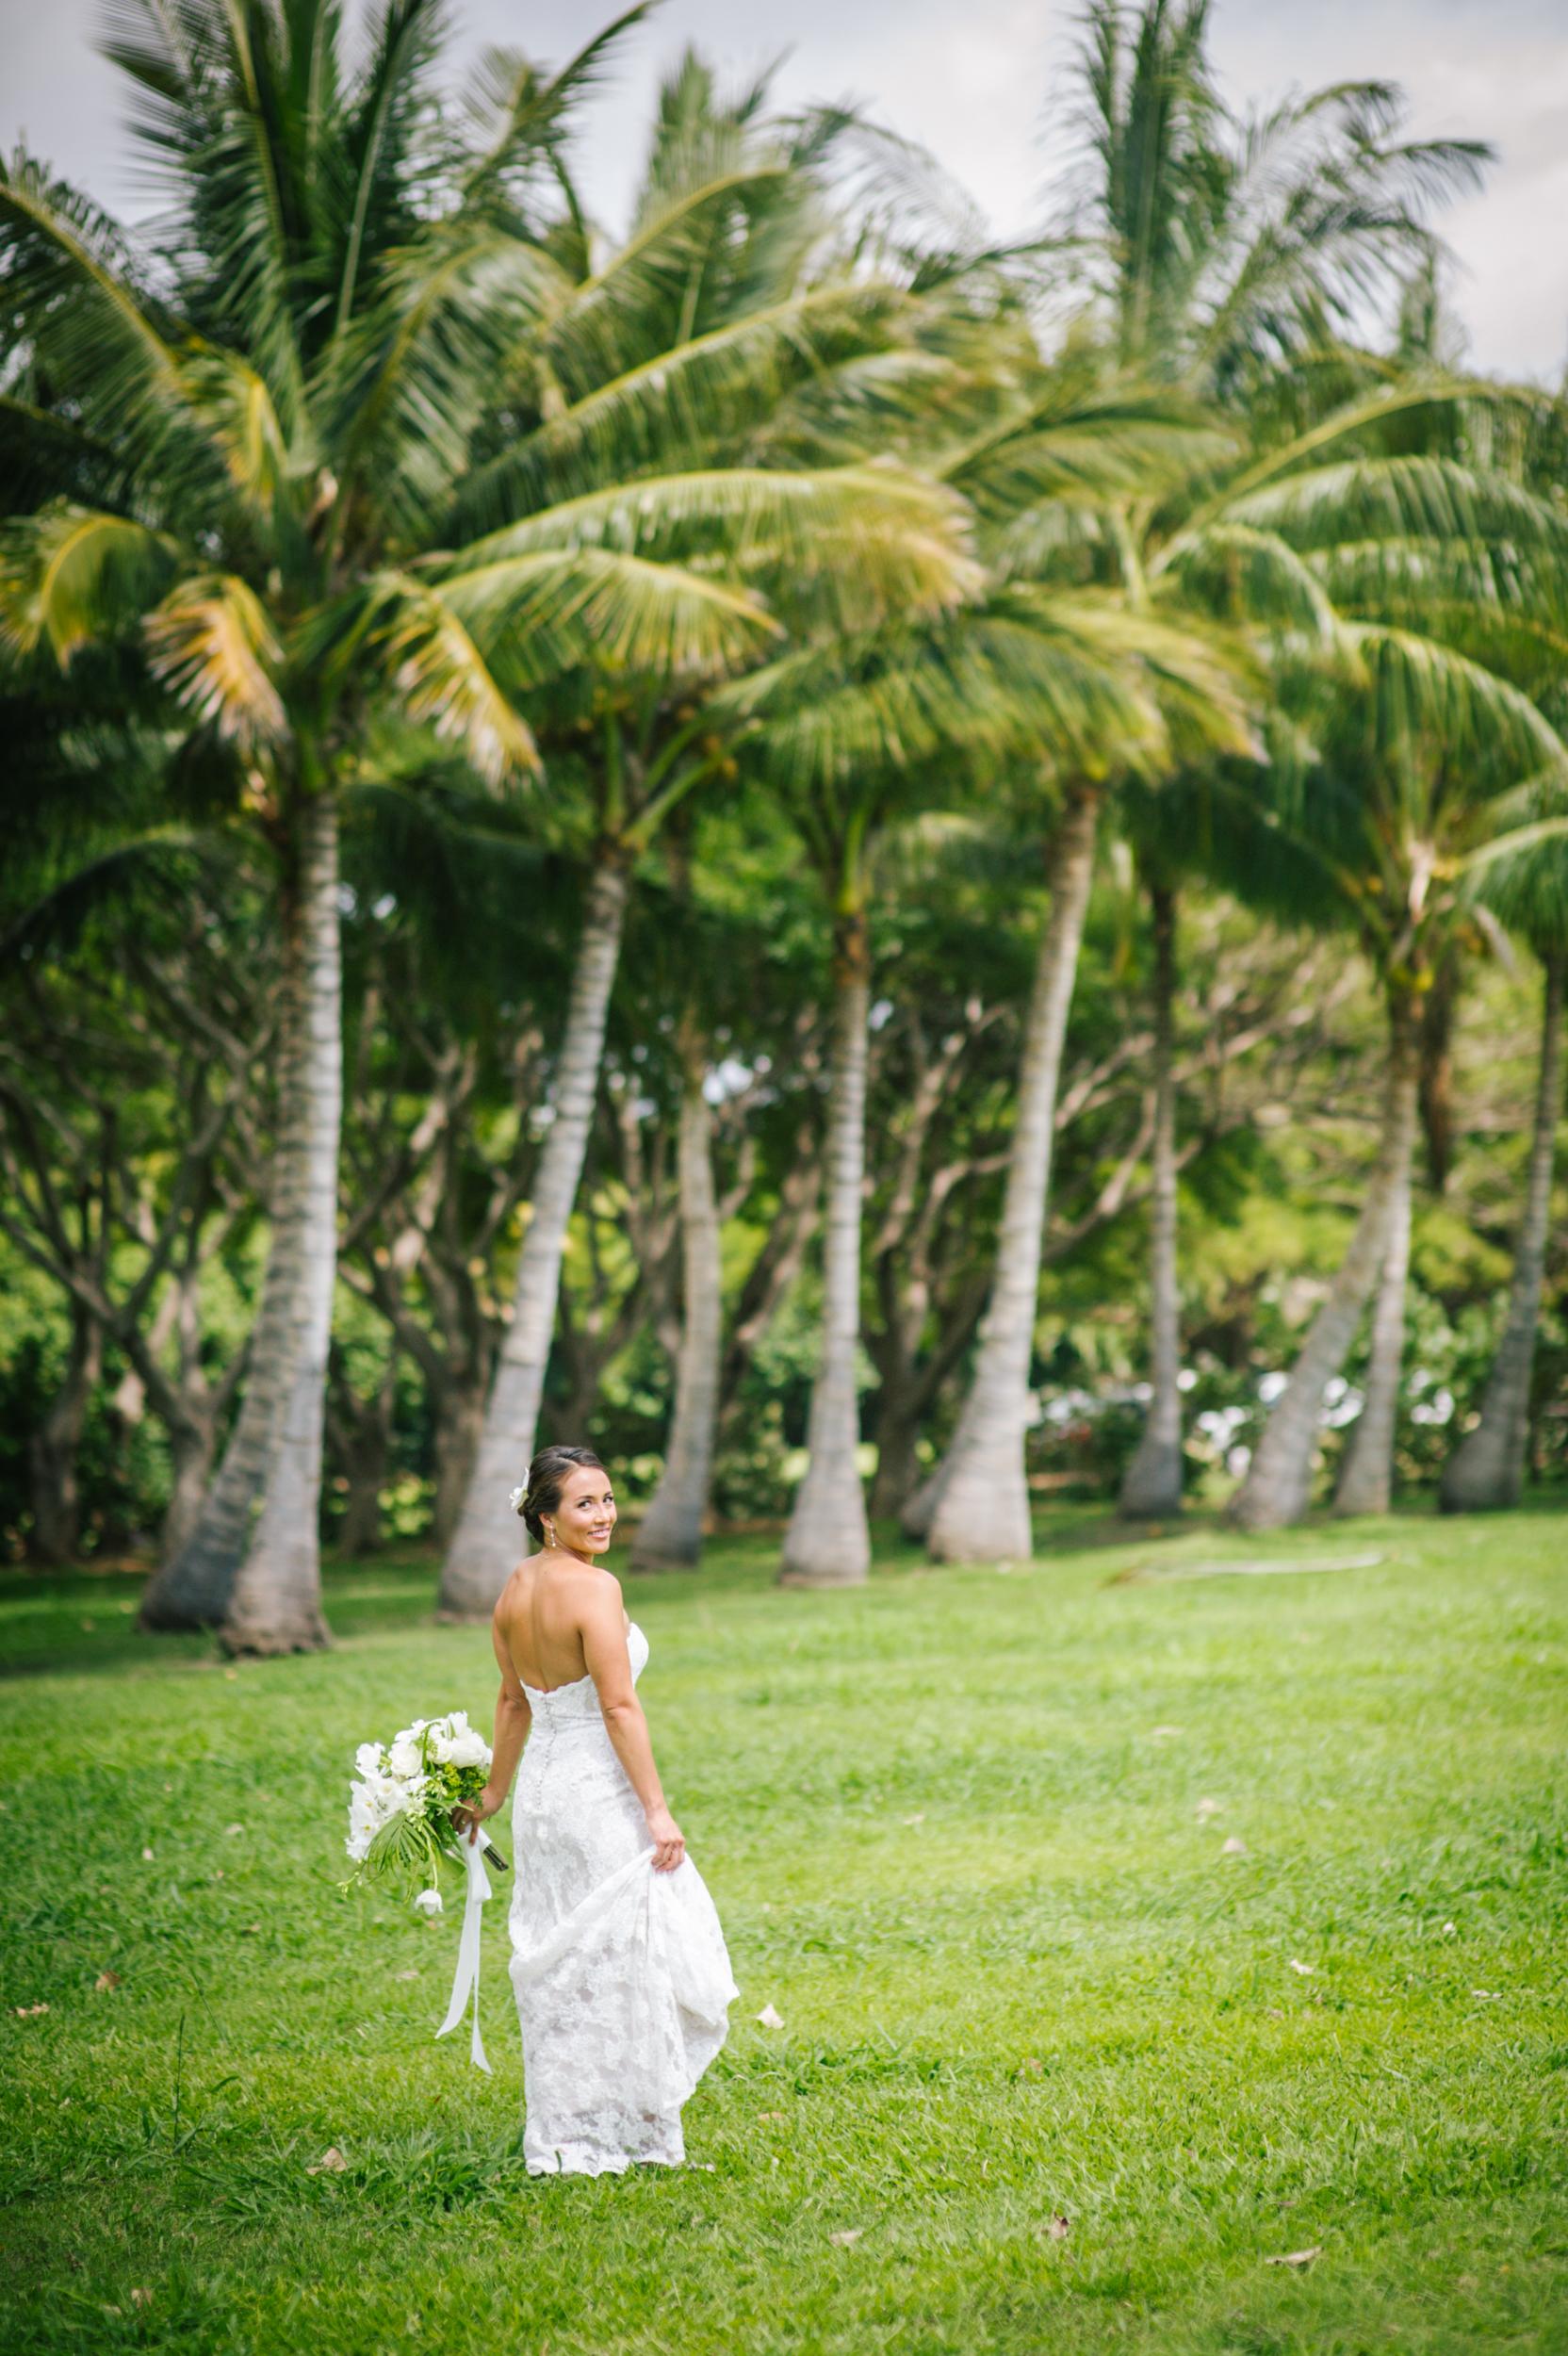 JKP-Destination-Weddings-0075.JPG